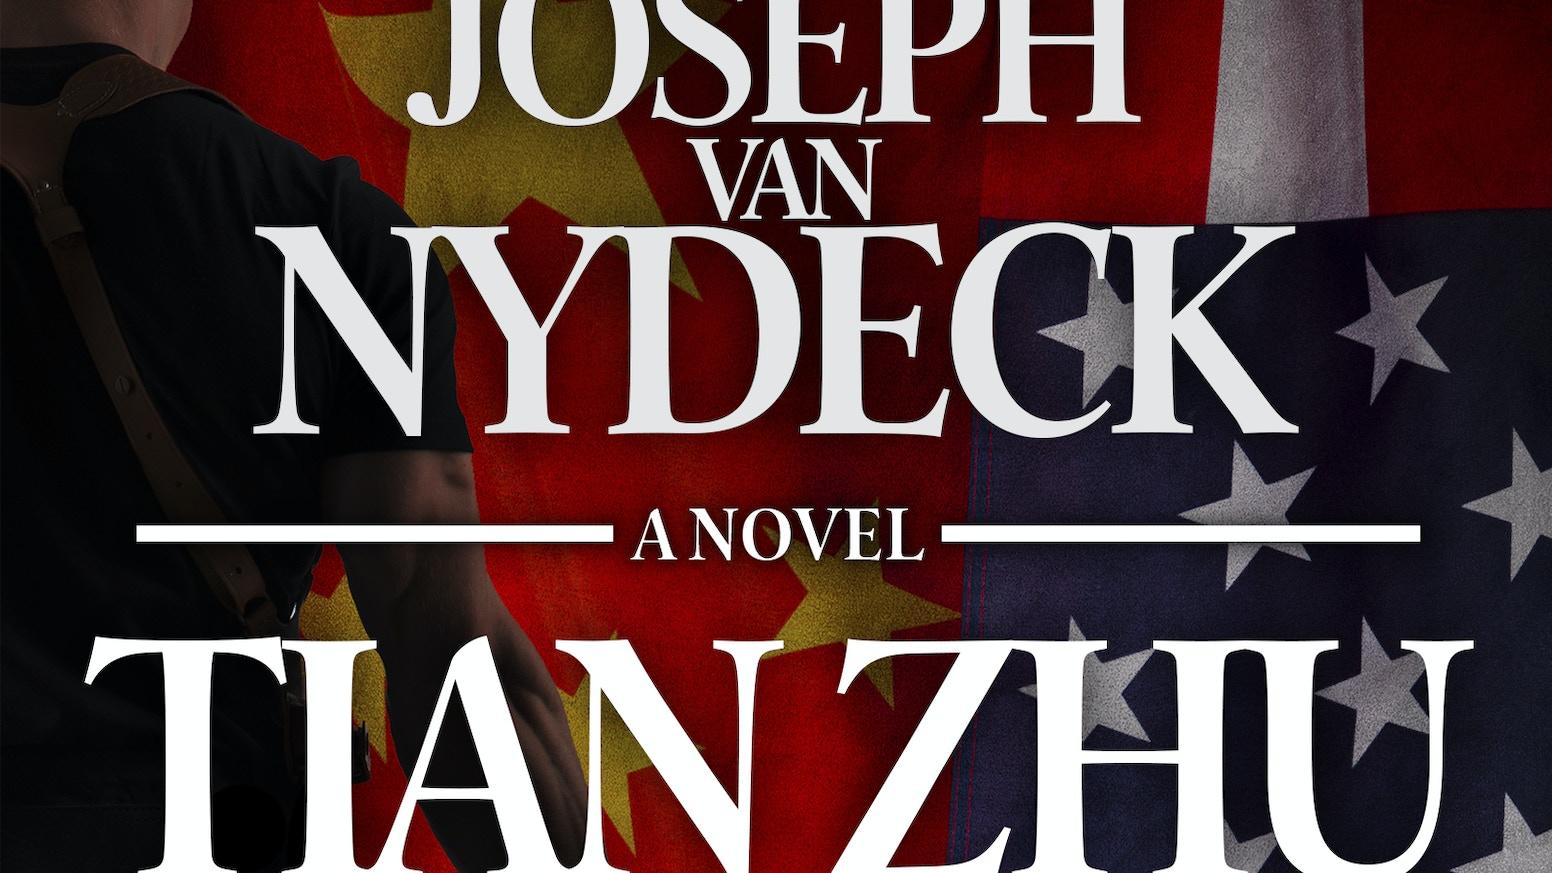 A Joseph Van Nydeck Project by Nydeggen LLC » Tian Zhu hits